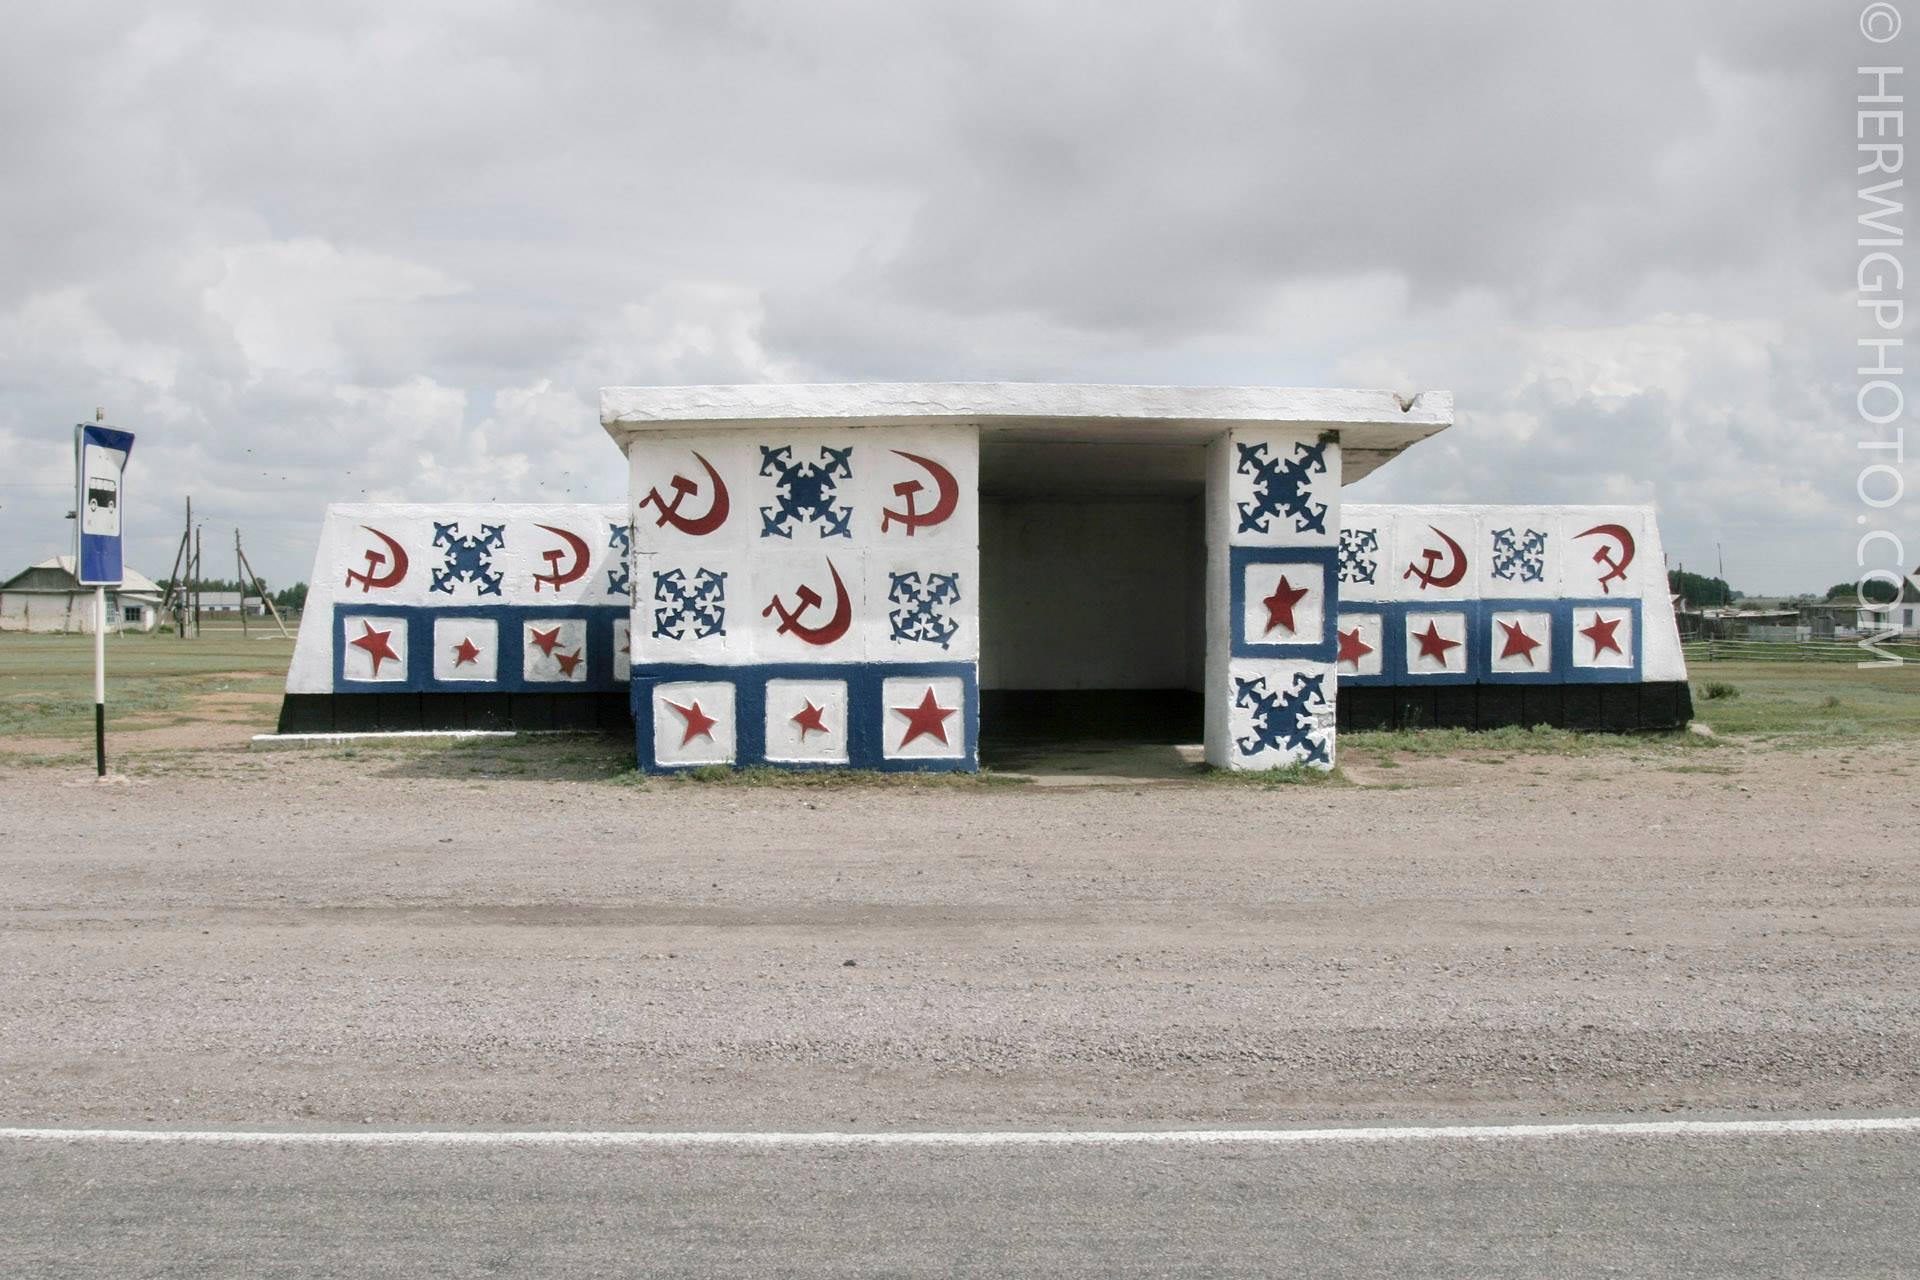 Soviet Bus Stops - Christopher Herwig - Astana, Kazakhstan